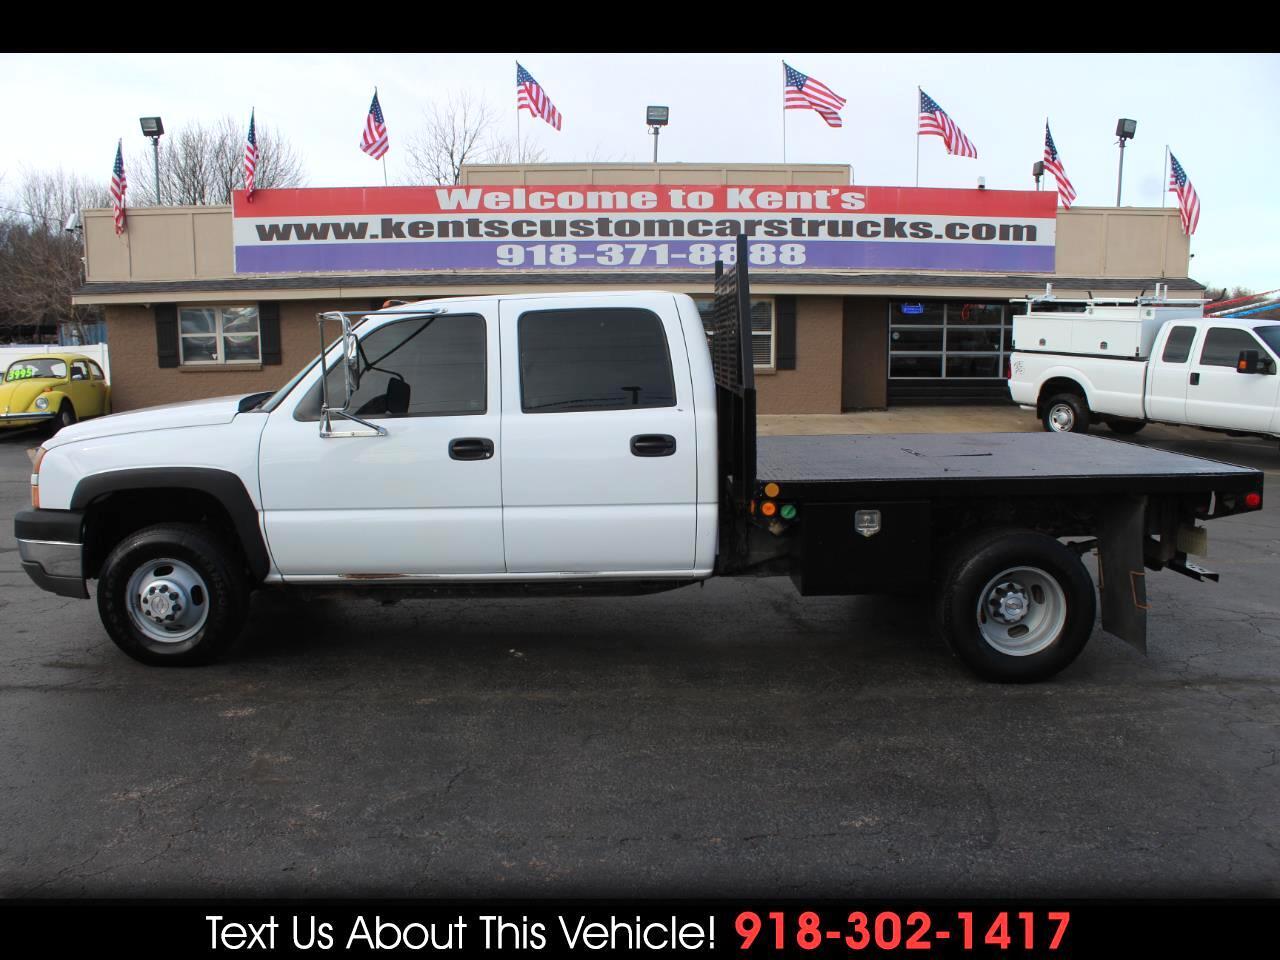 2007 Chevrolet Silverado Classic 3500 Work Truck Crew Cab DRW 2WD Flatbed